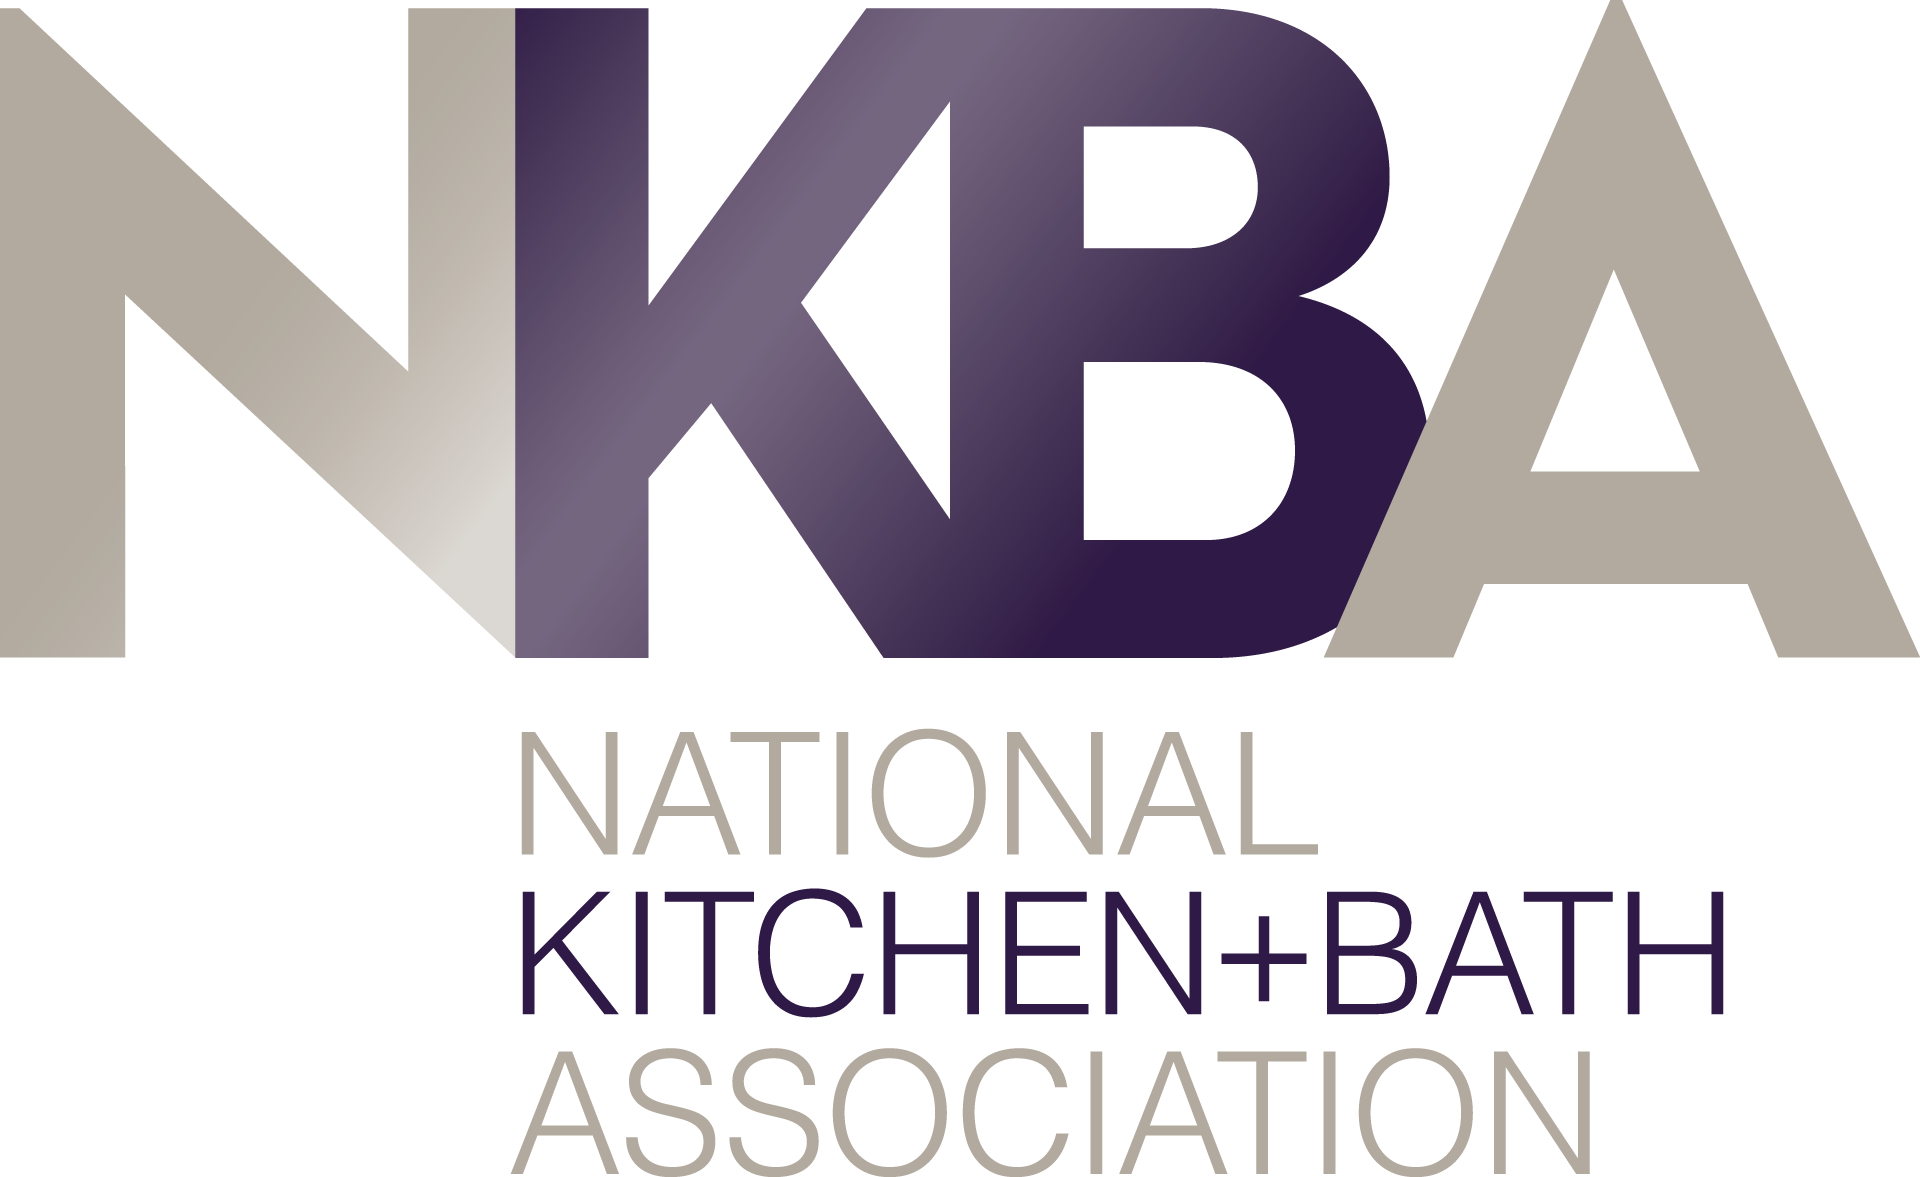 NKBA_LogoMaster_2695.png